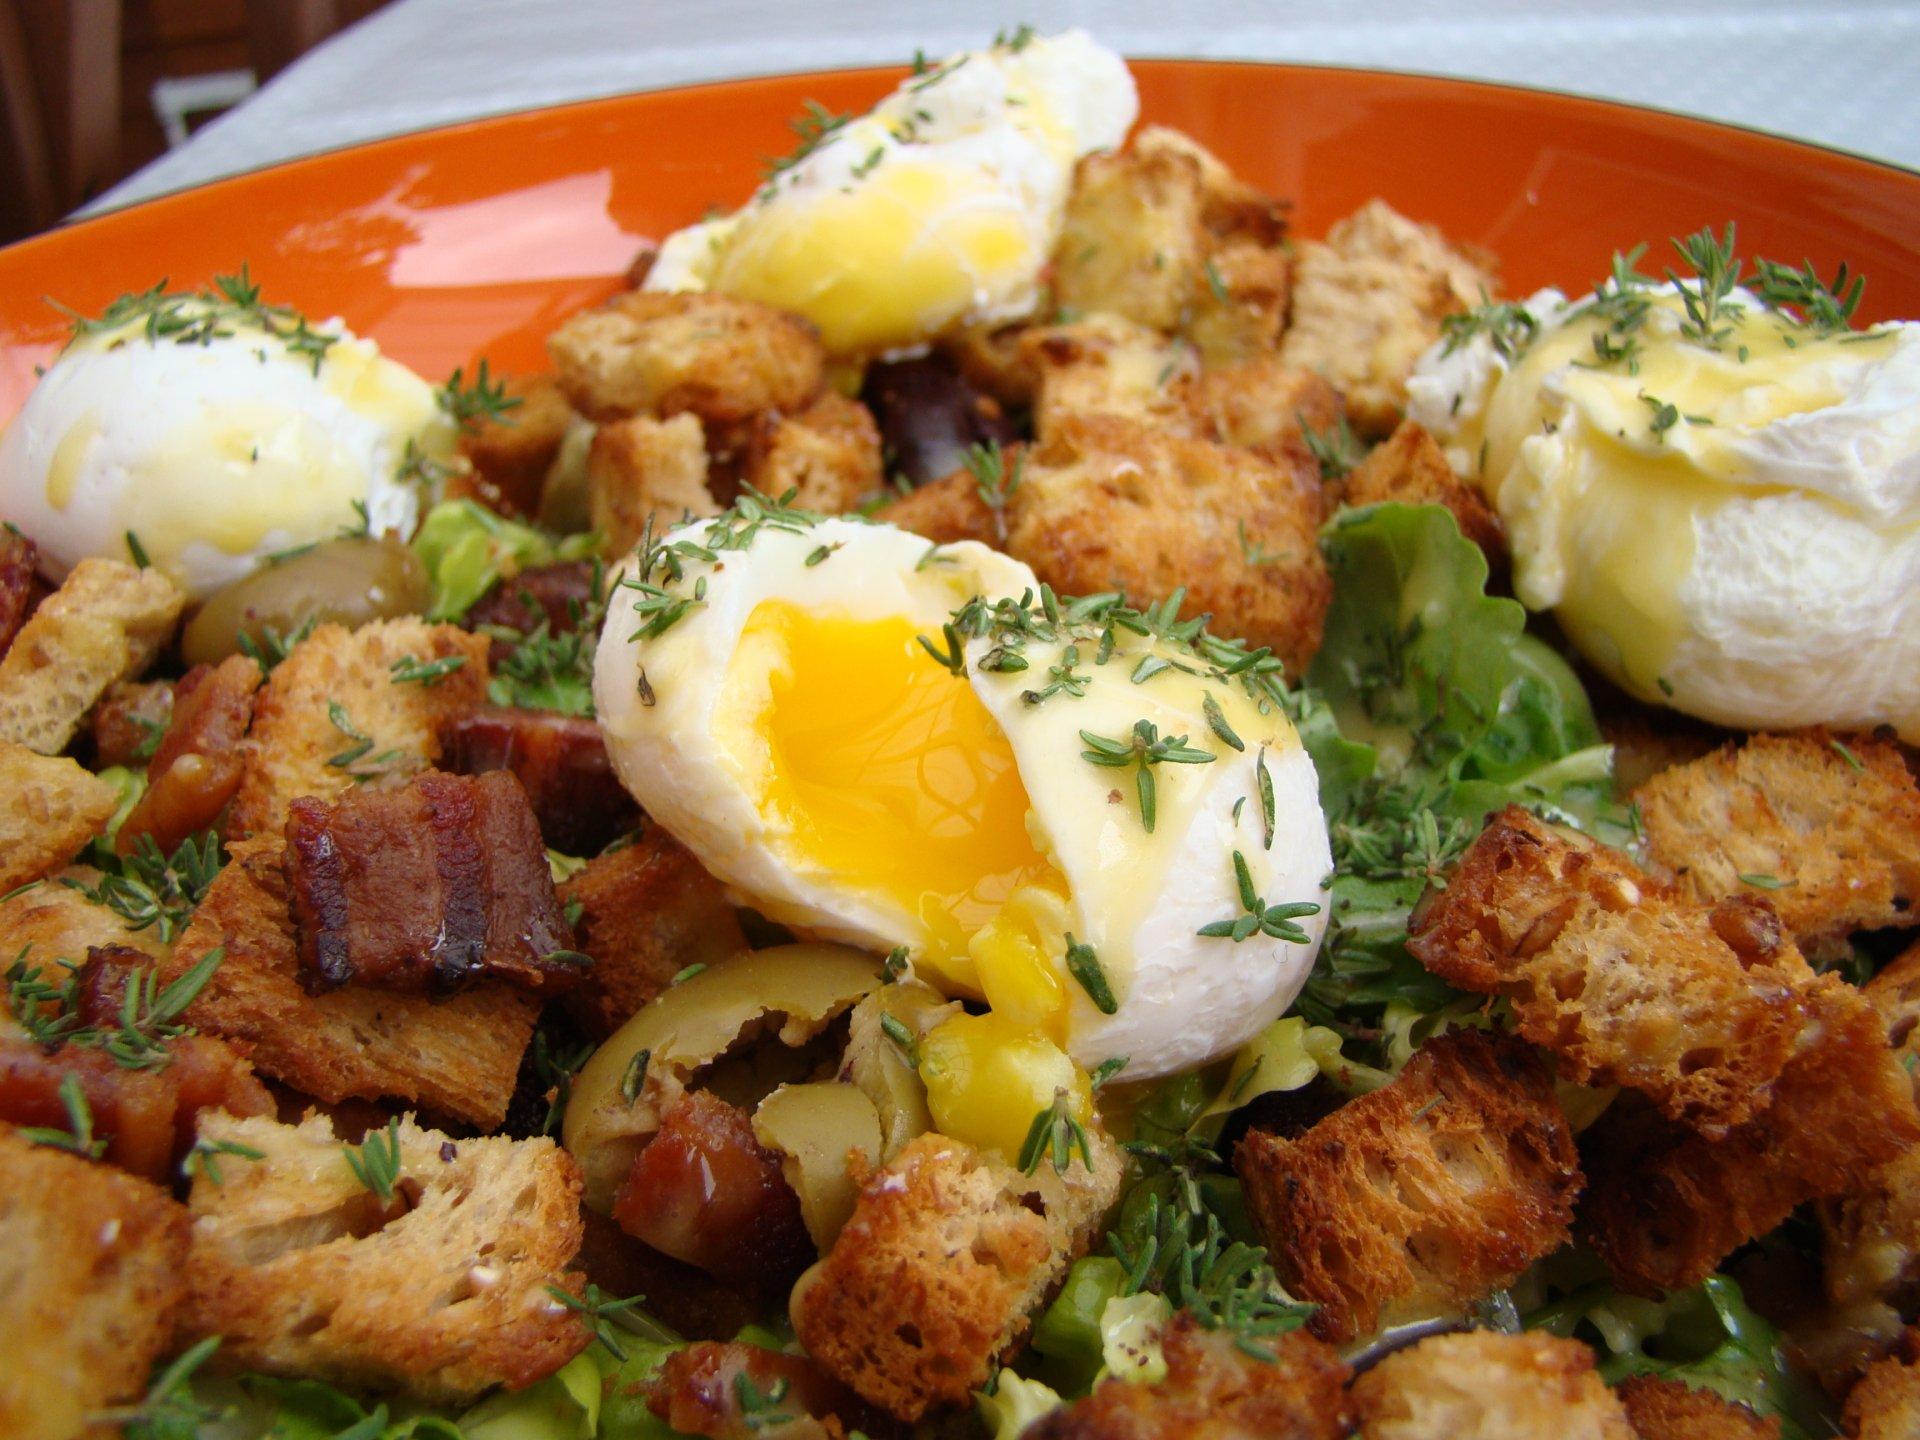 Food - Salade Lyonnaise  Lunch Egg Meal Wallpaper